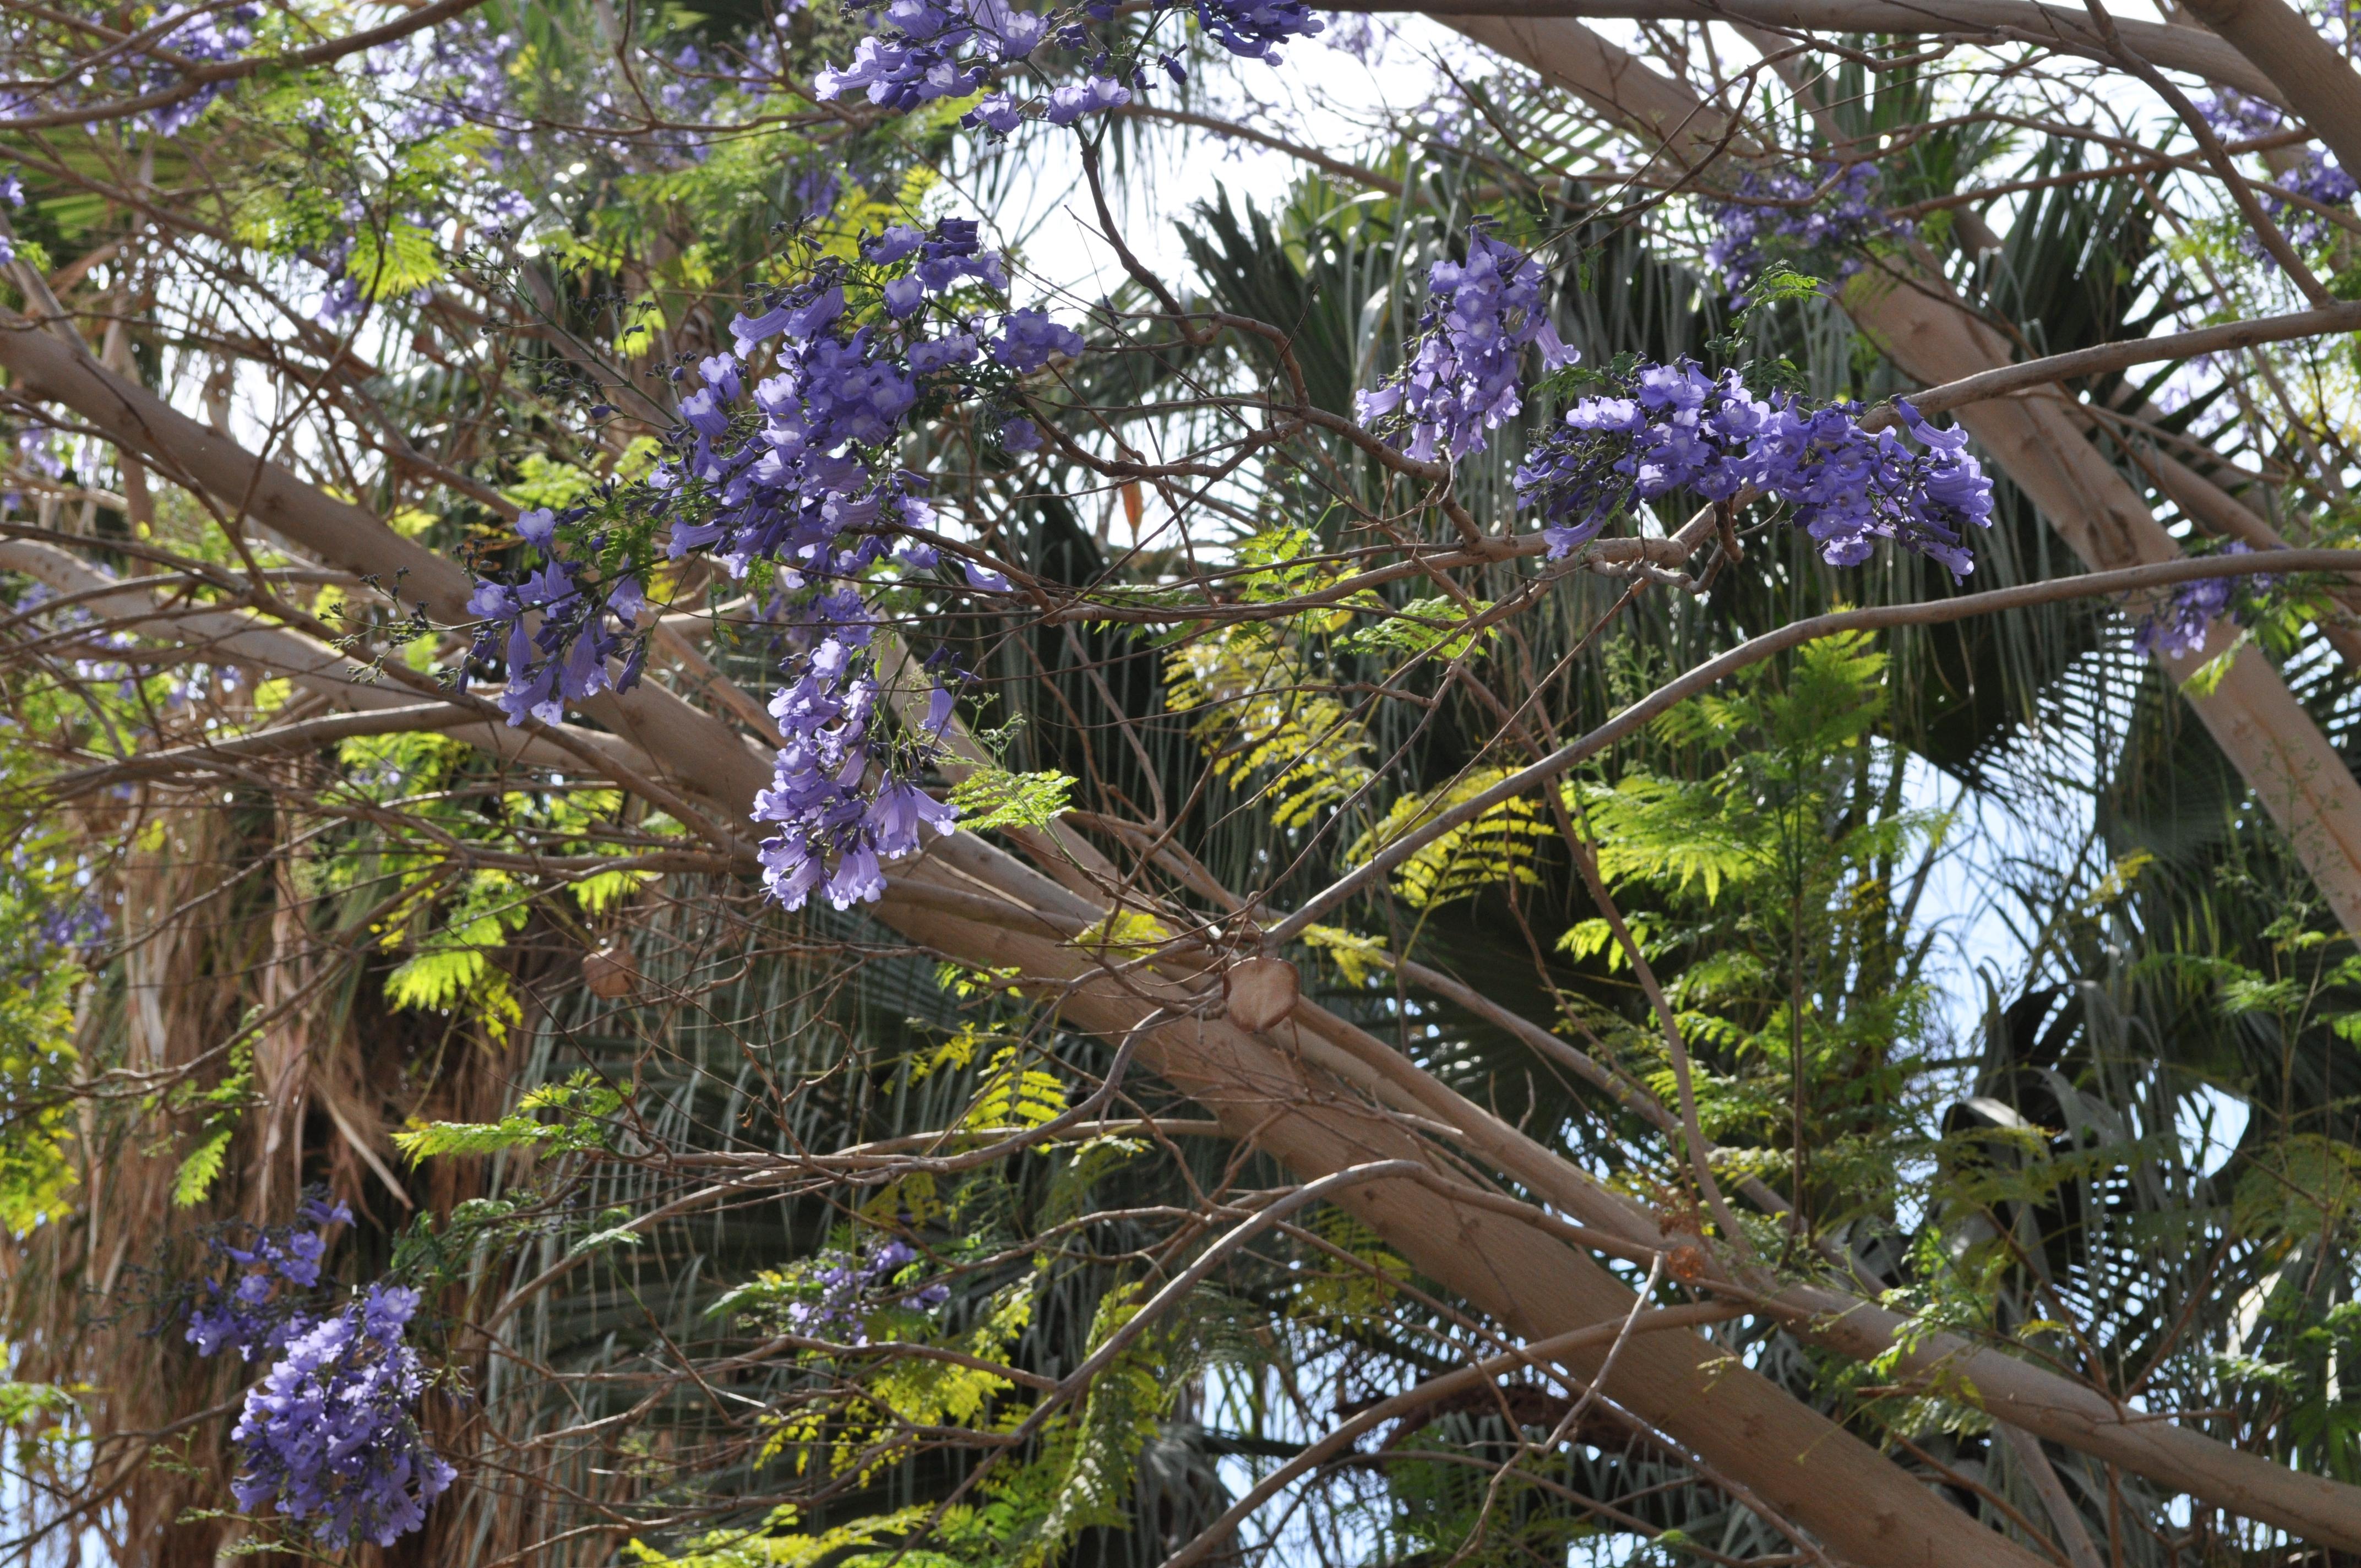 rocaille-blog-israel-dead-sea-ein-gedi-kibbutz-botanical-gardens-9